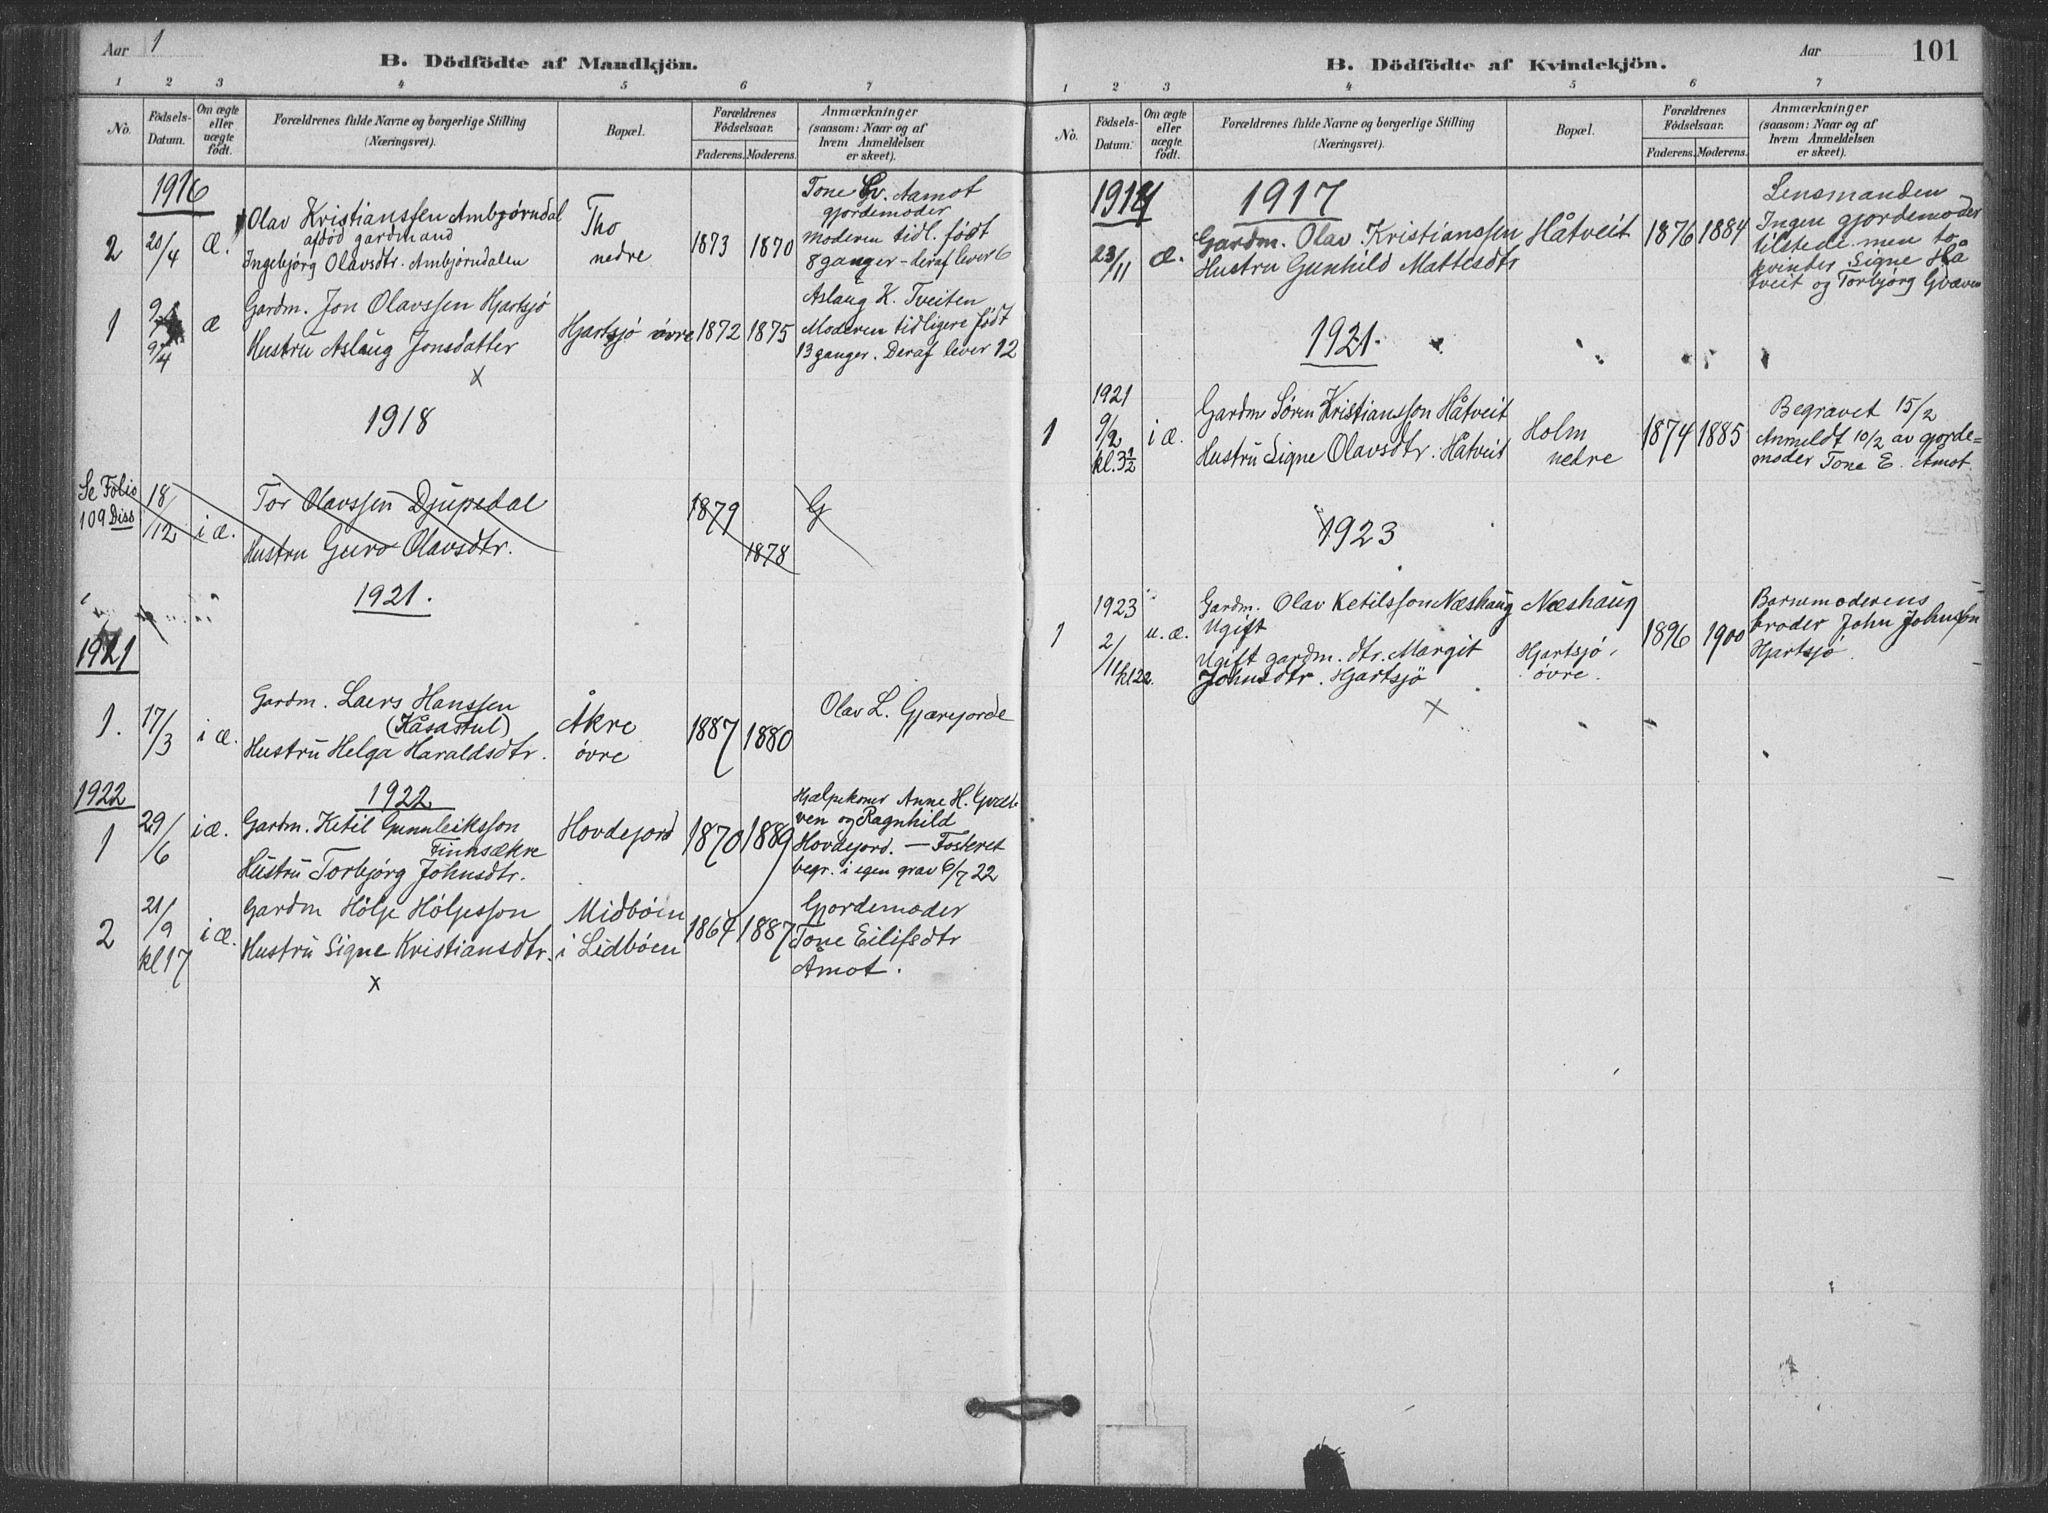 SAKO, Hjartdal kirkebøker, F/Fa/L0010: Ministerialbok nr. I 10, 1880-1929, s. 101